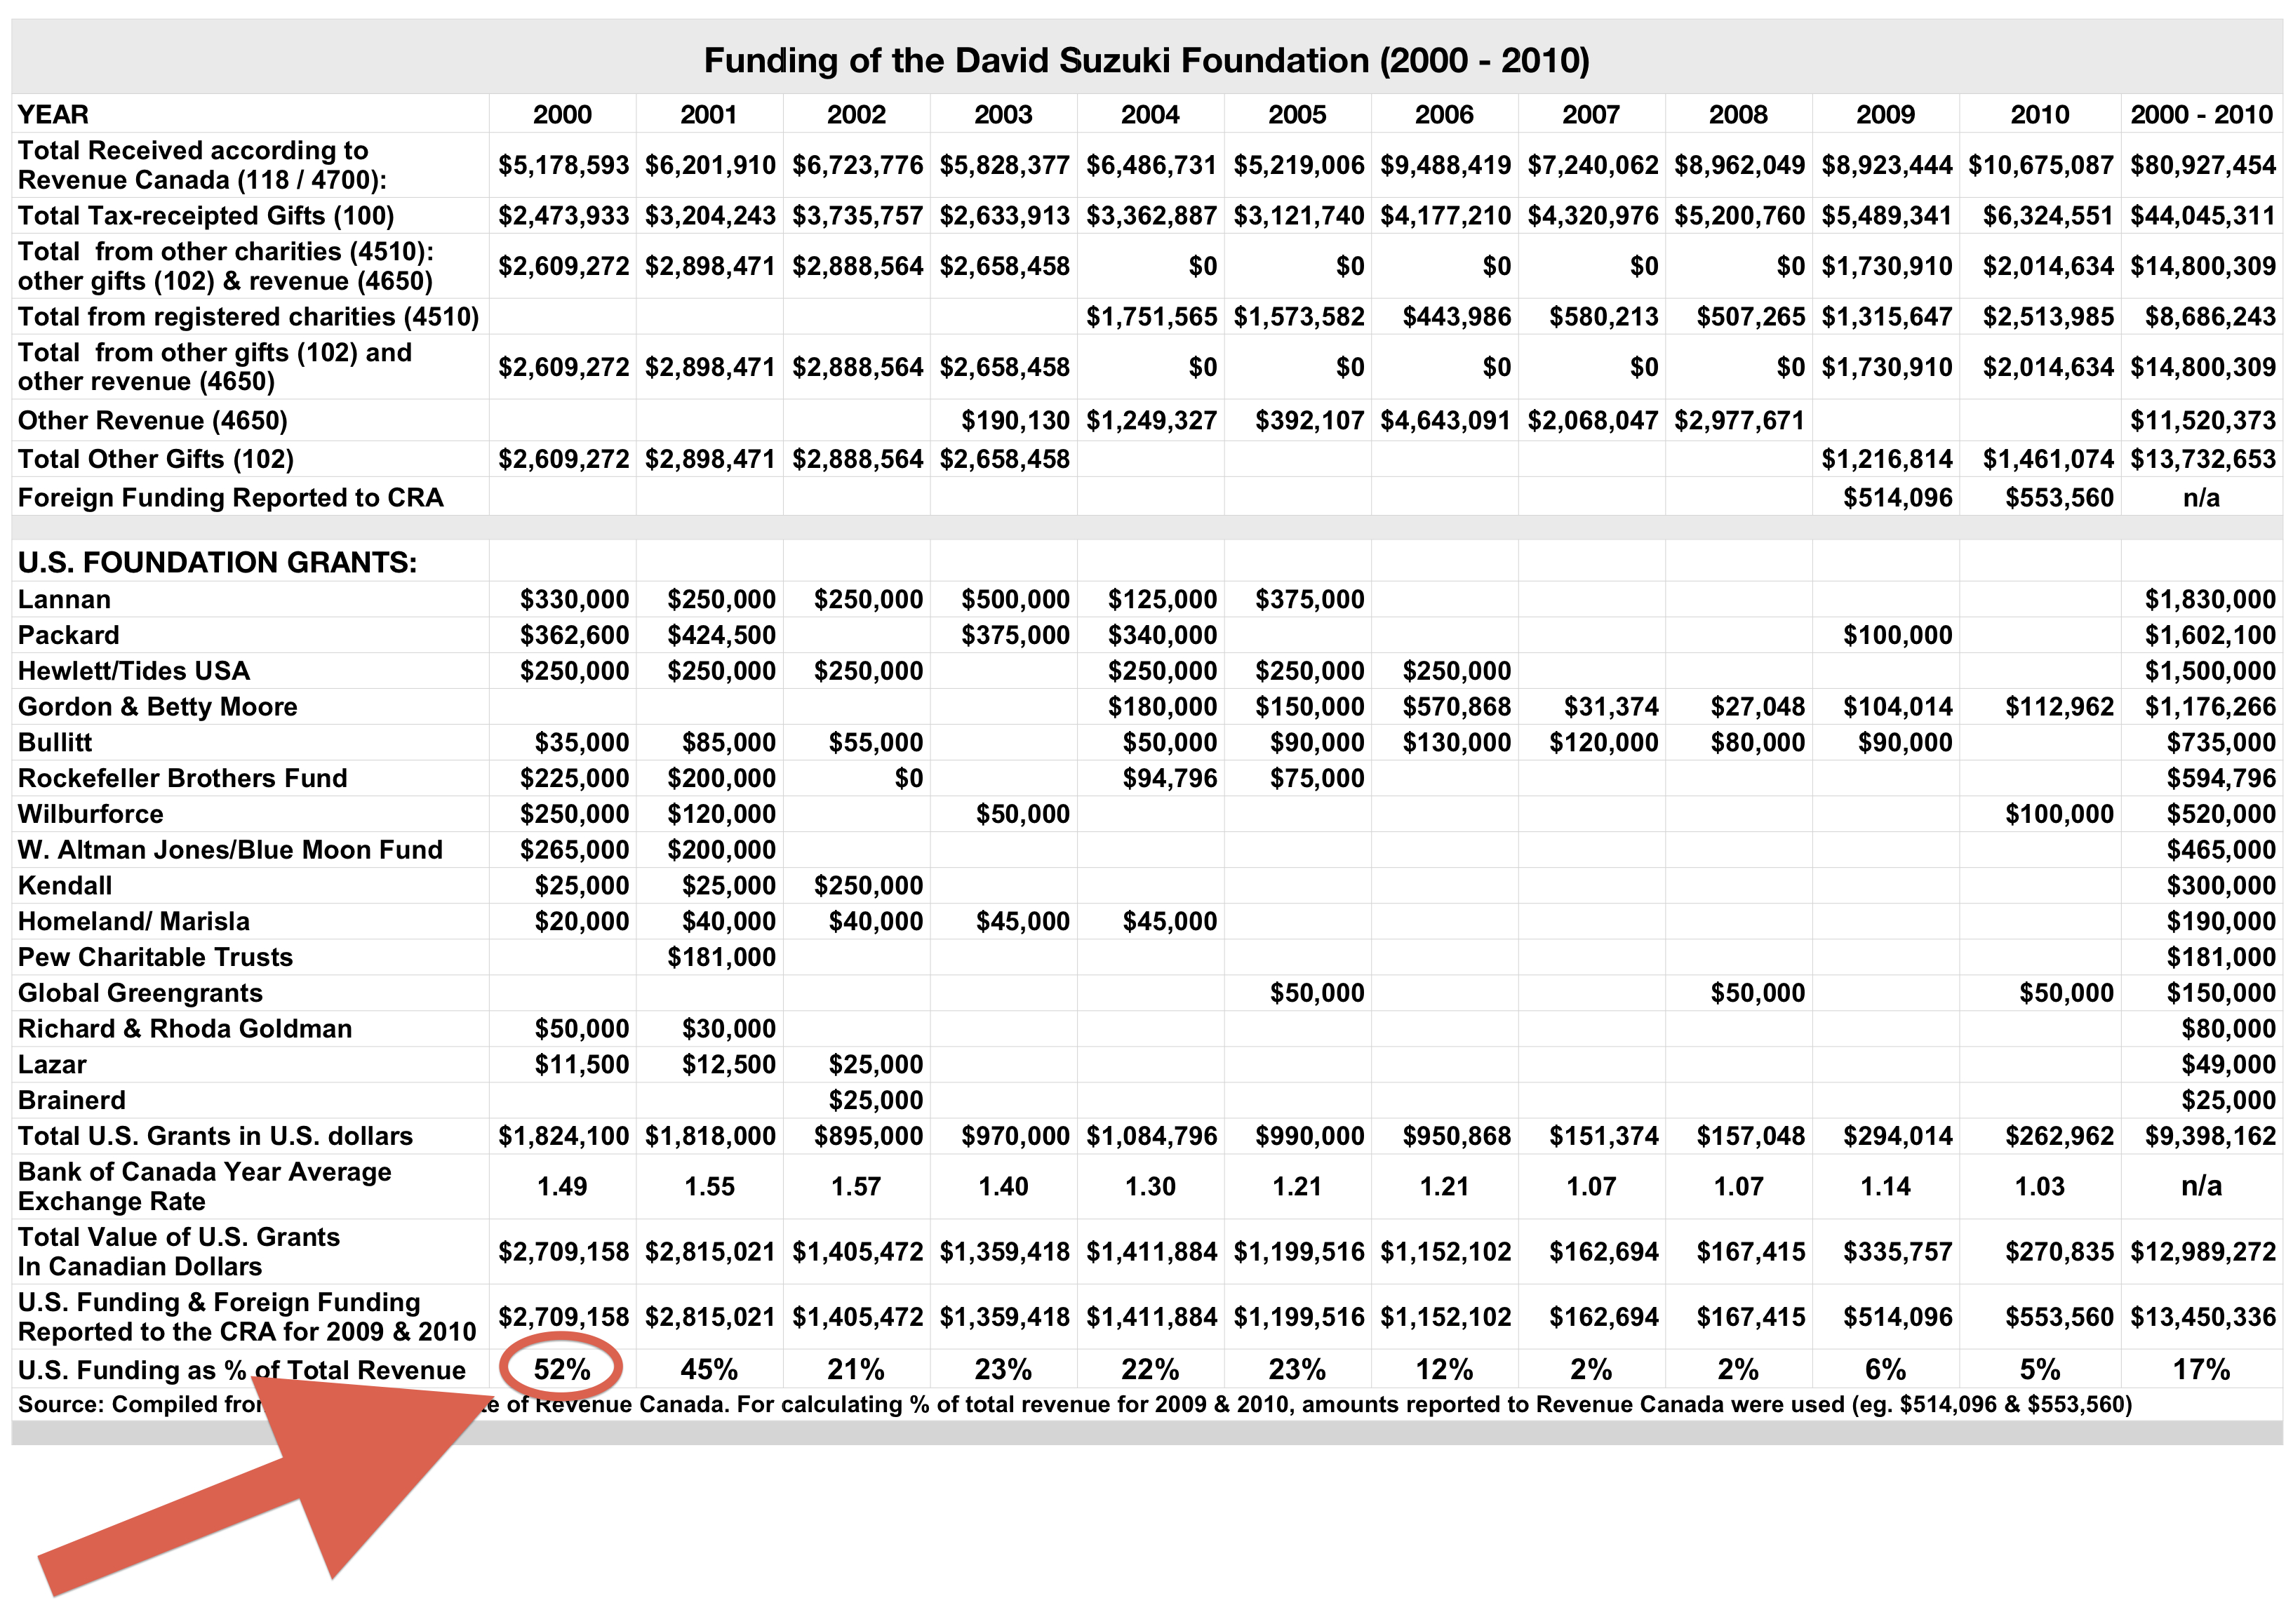 13 million paid to the david suzuki s foundation from u s